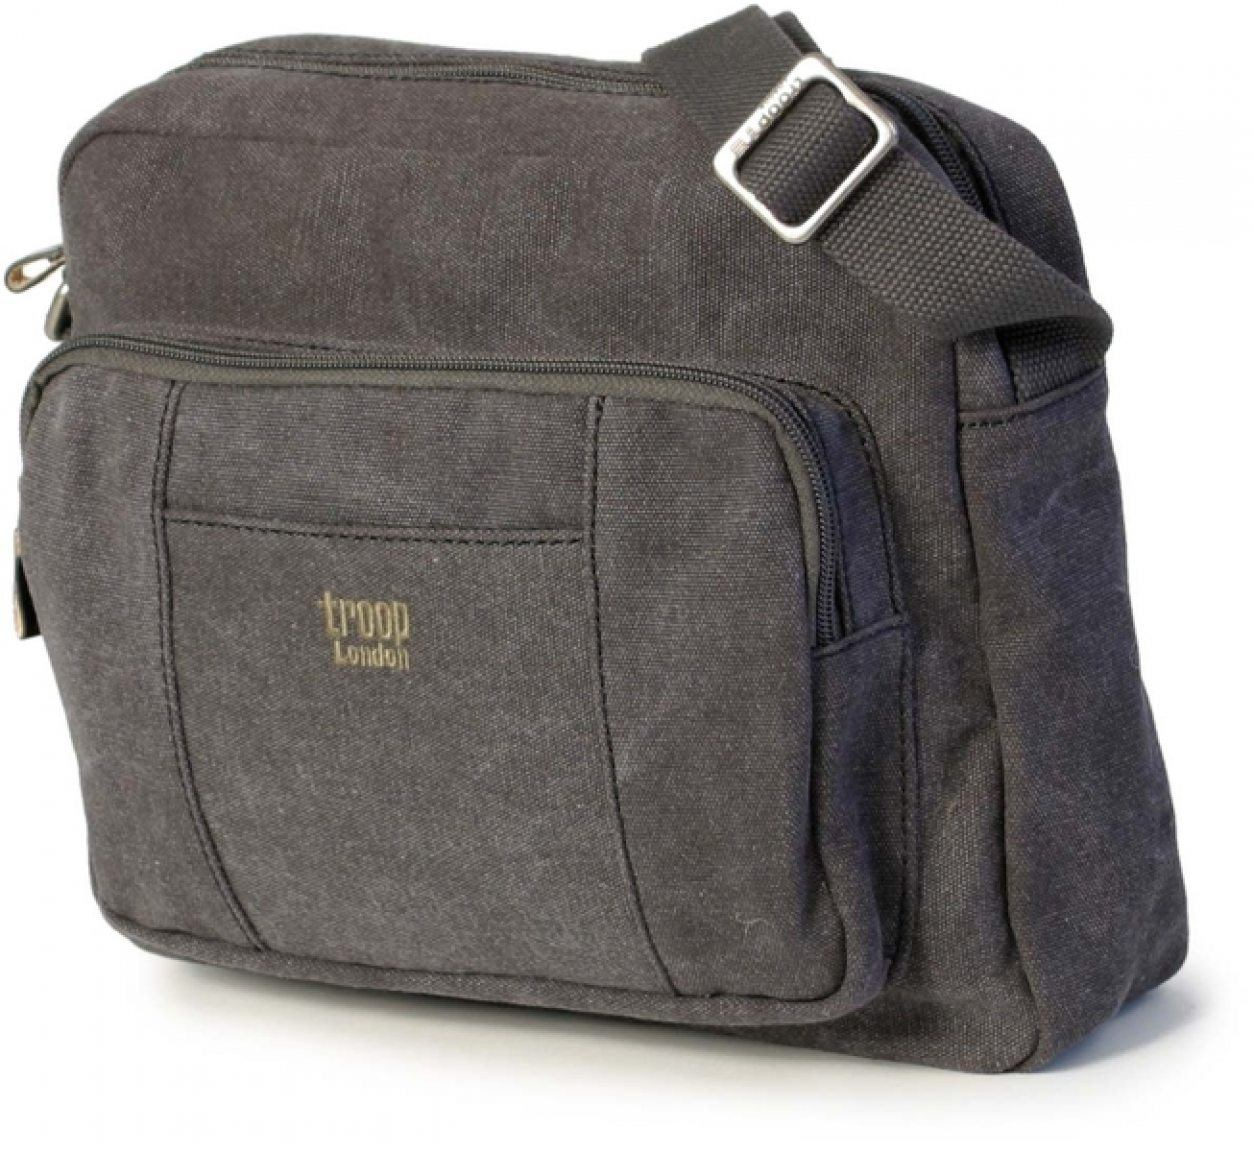 Reißverschlusstasche Troop Stoff Schwarz Bags More